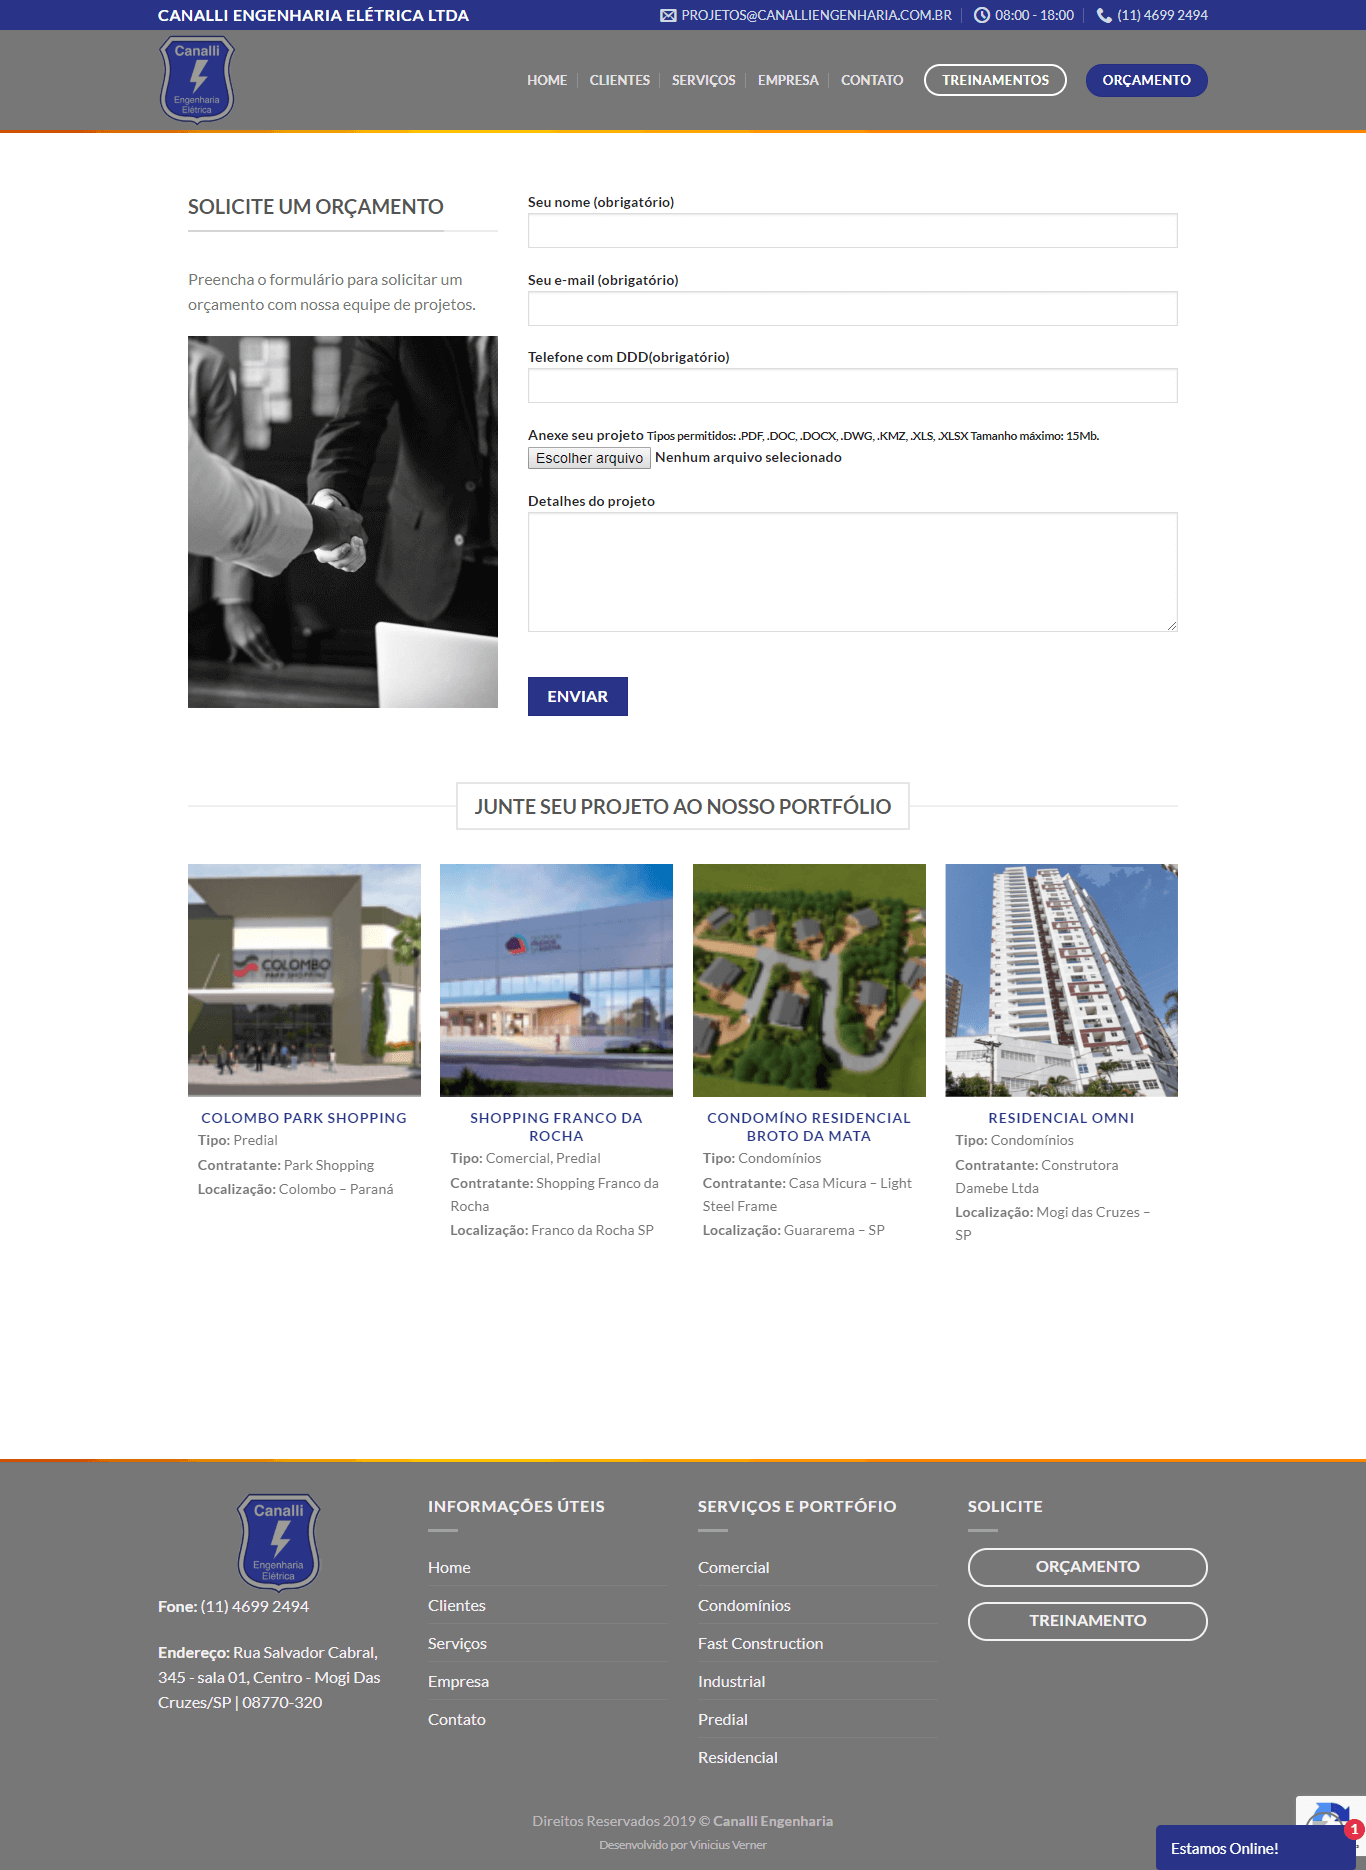 canalliengenharia.com.br - Vinicius Verner